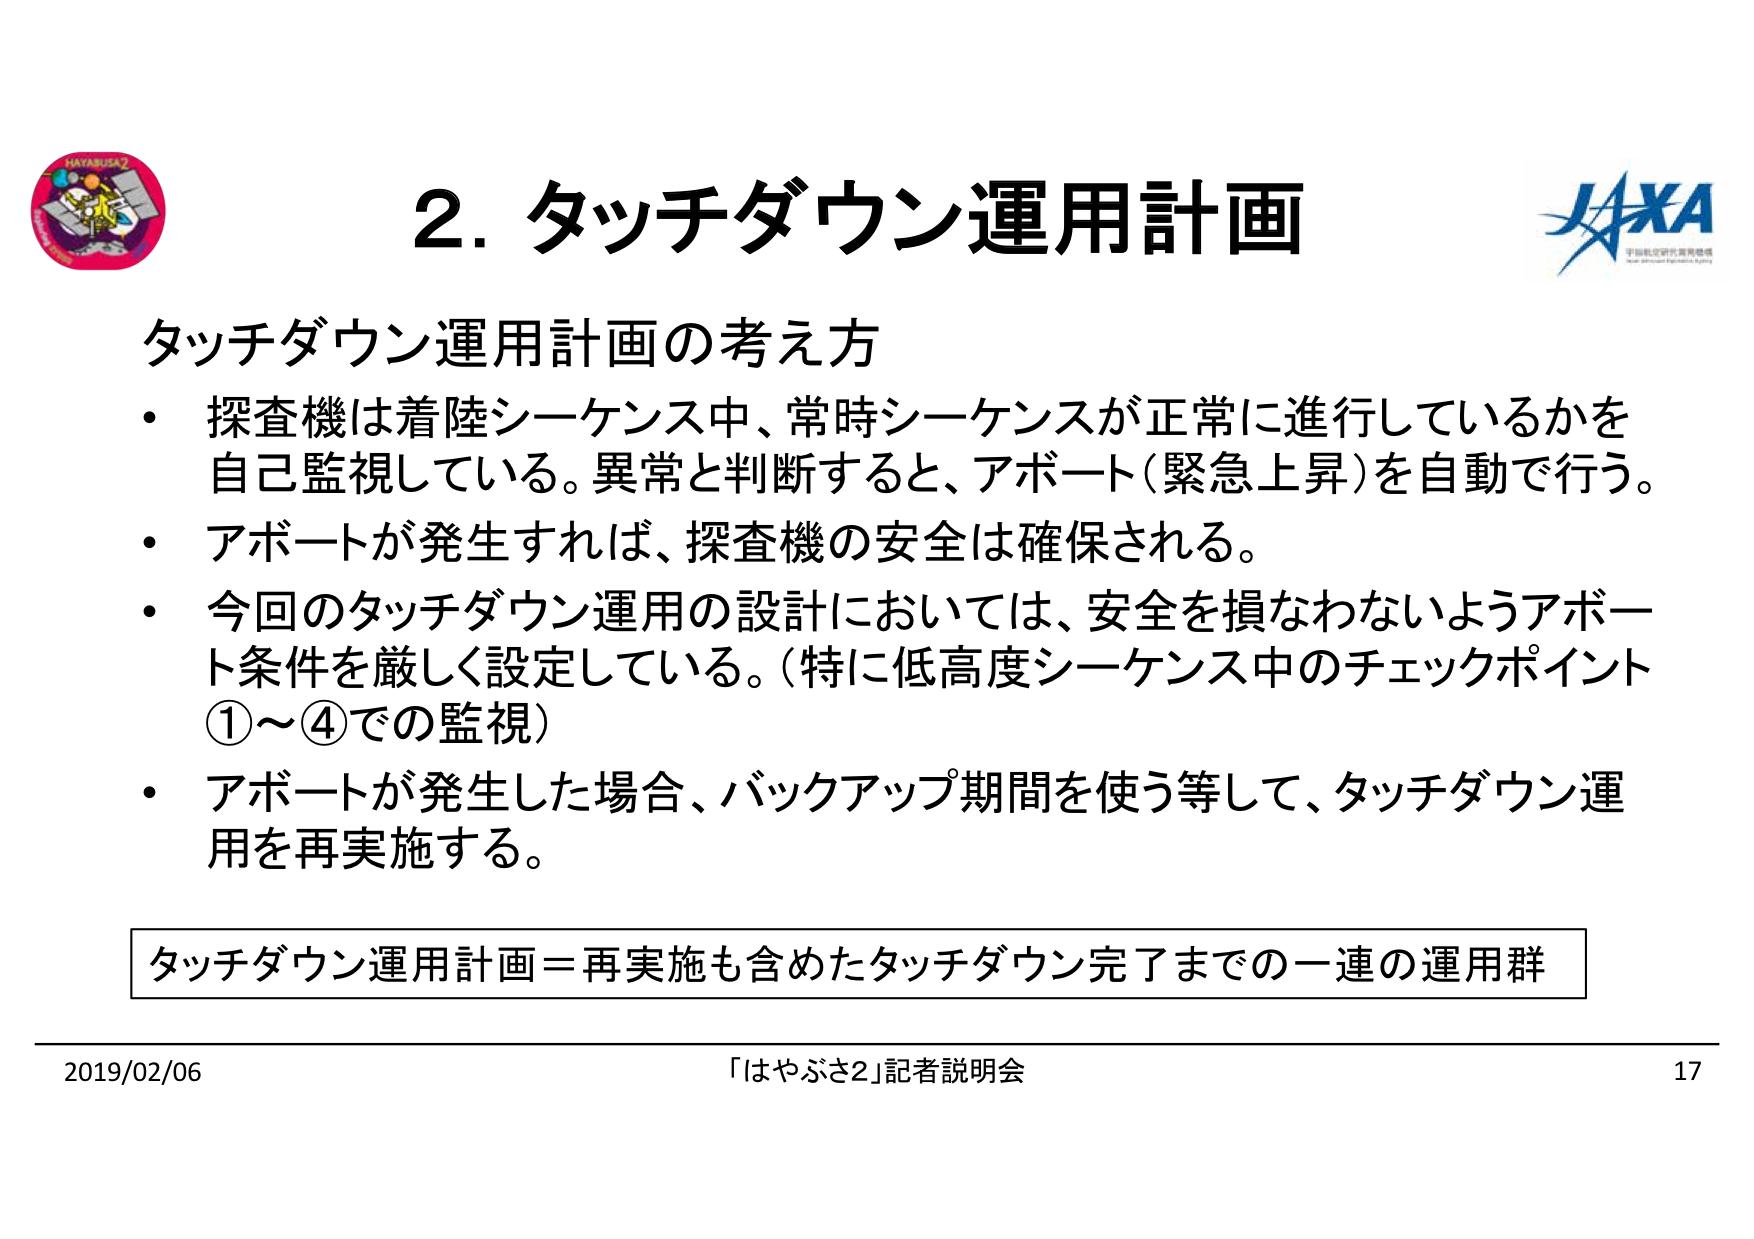 f:id:Imamura:20190204175511p:plain